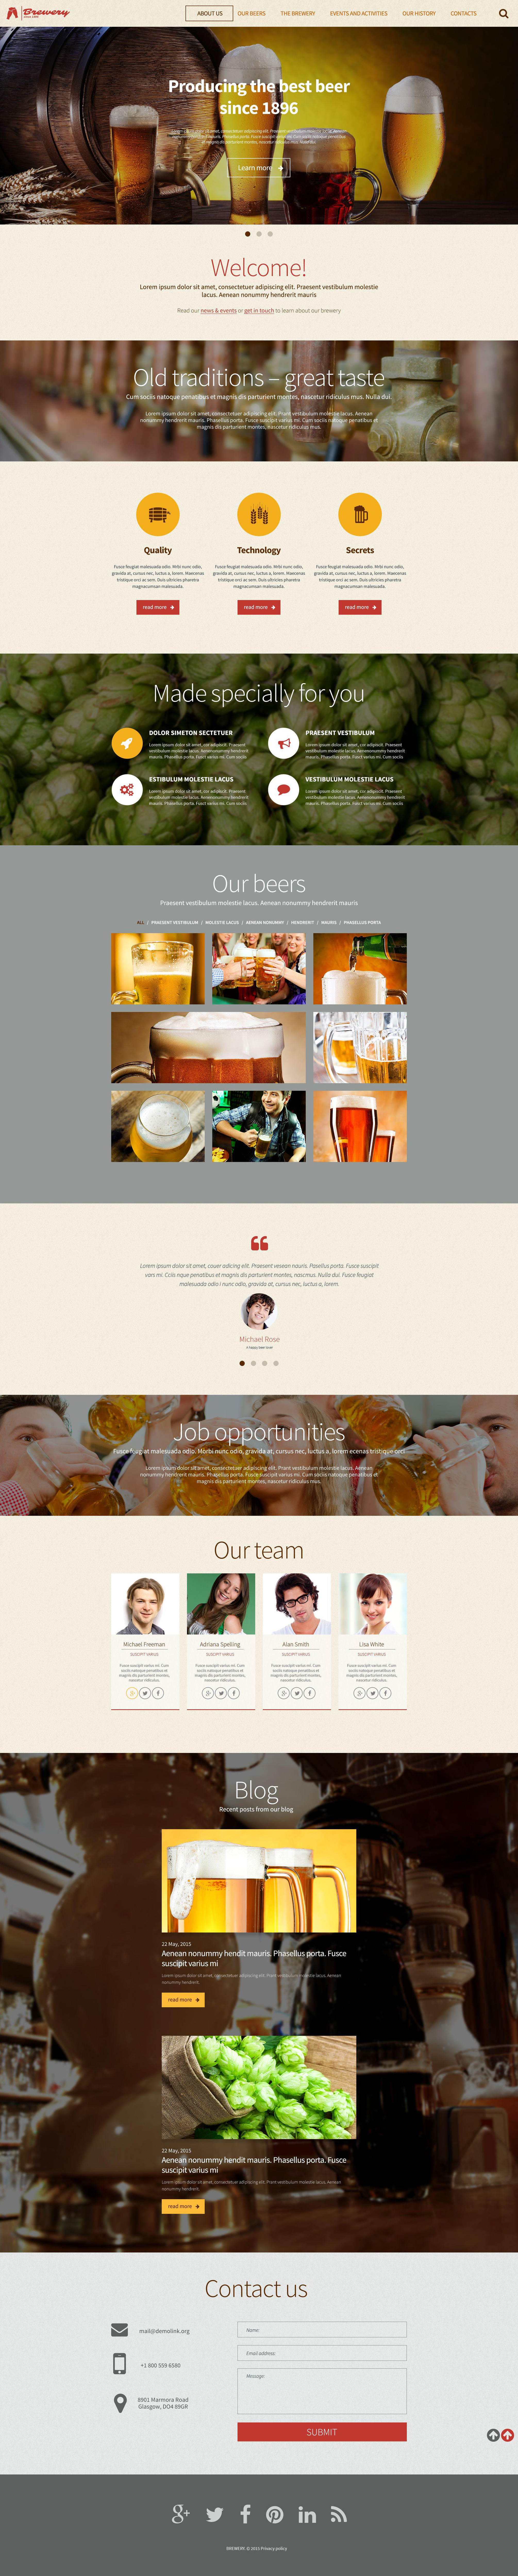 Responsive Brewery Wordpress #55486